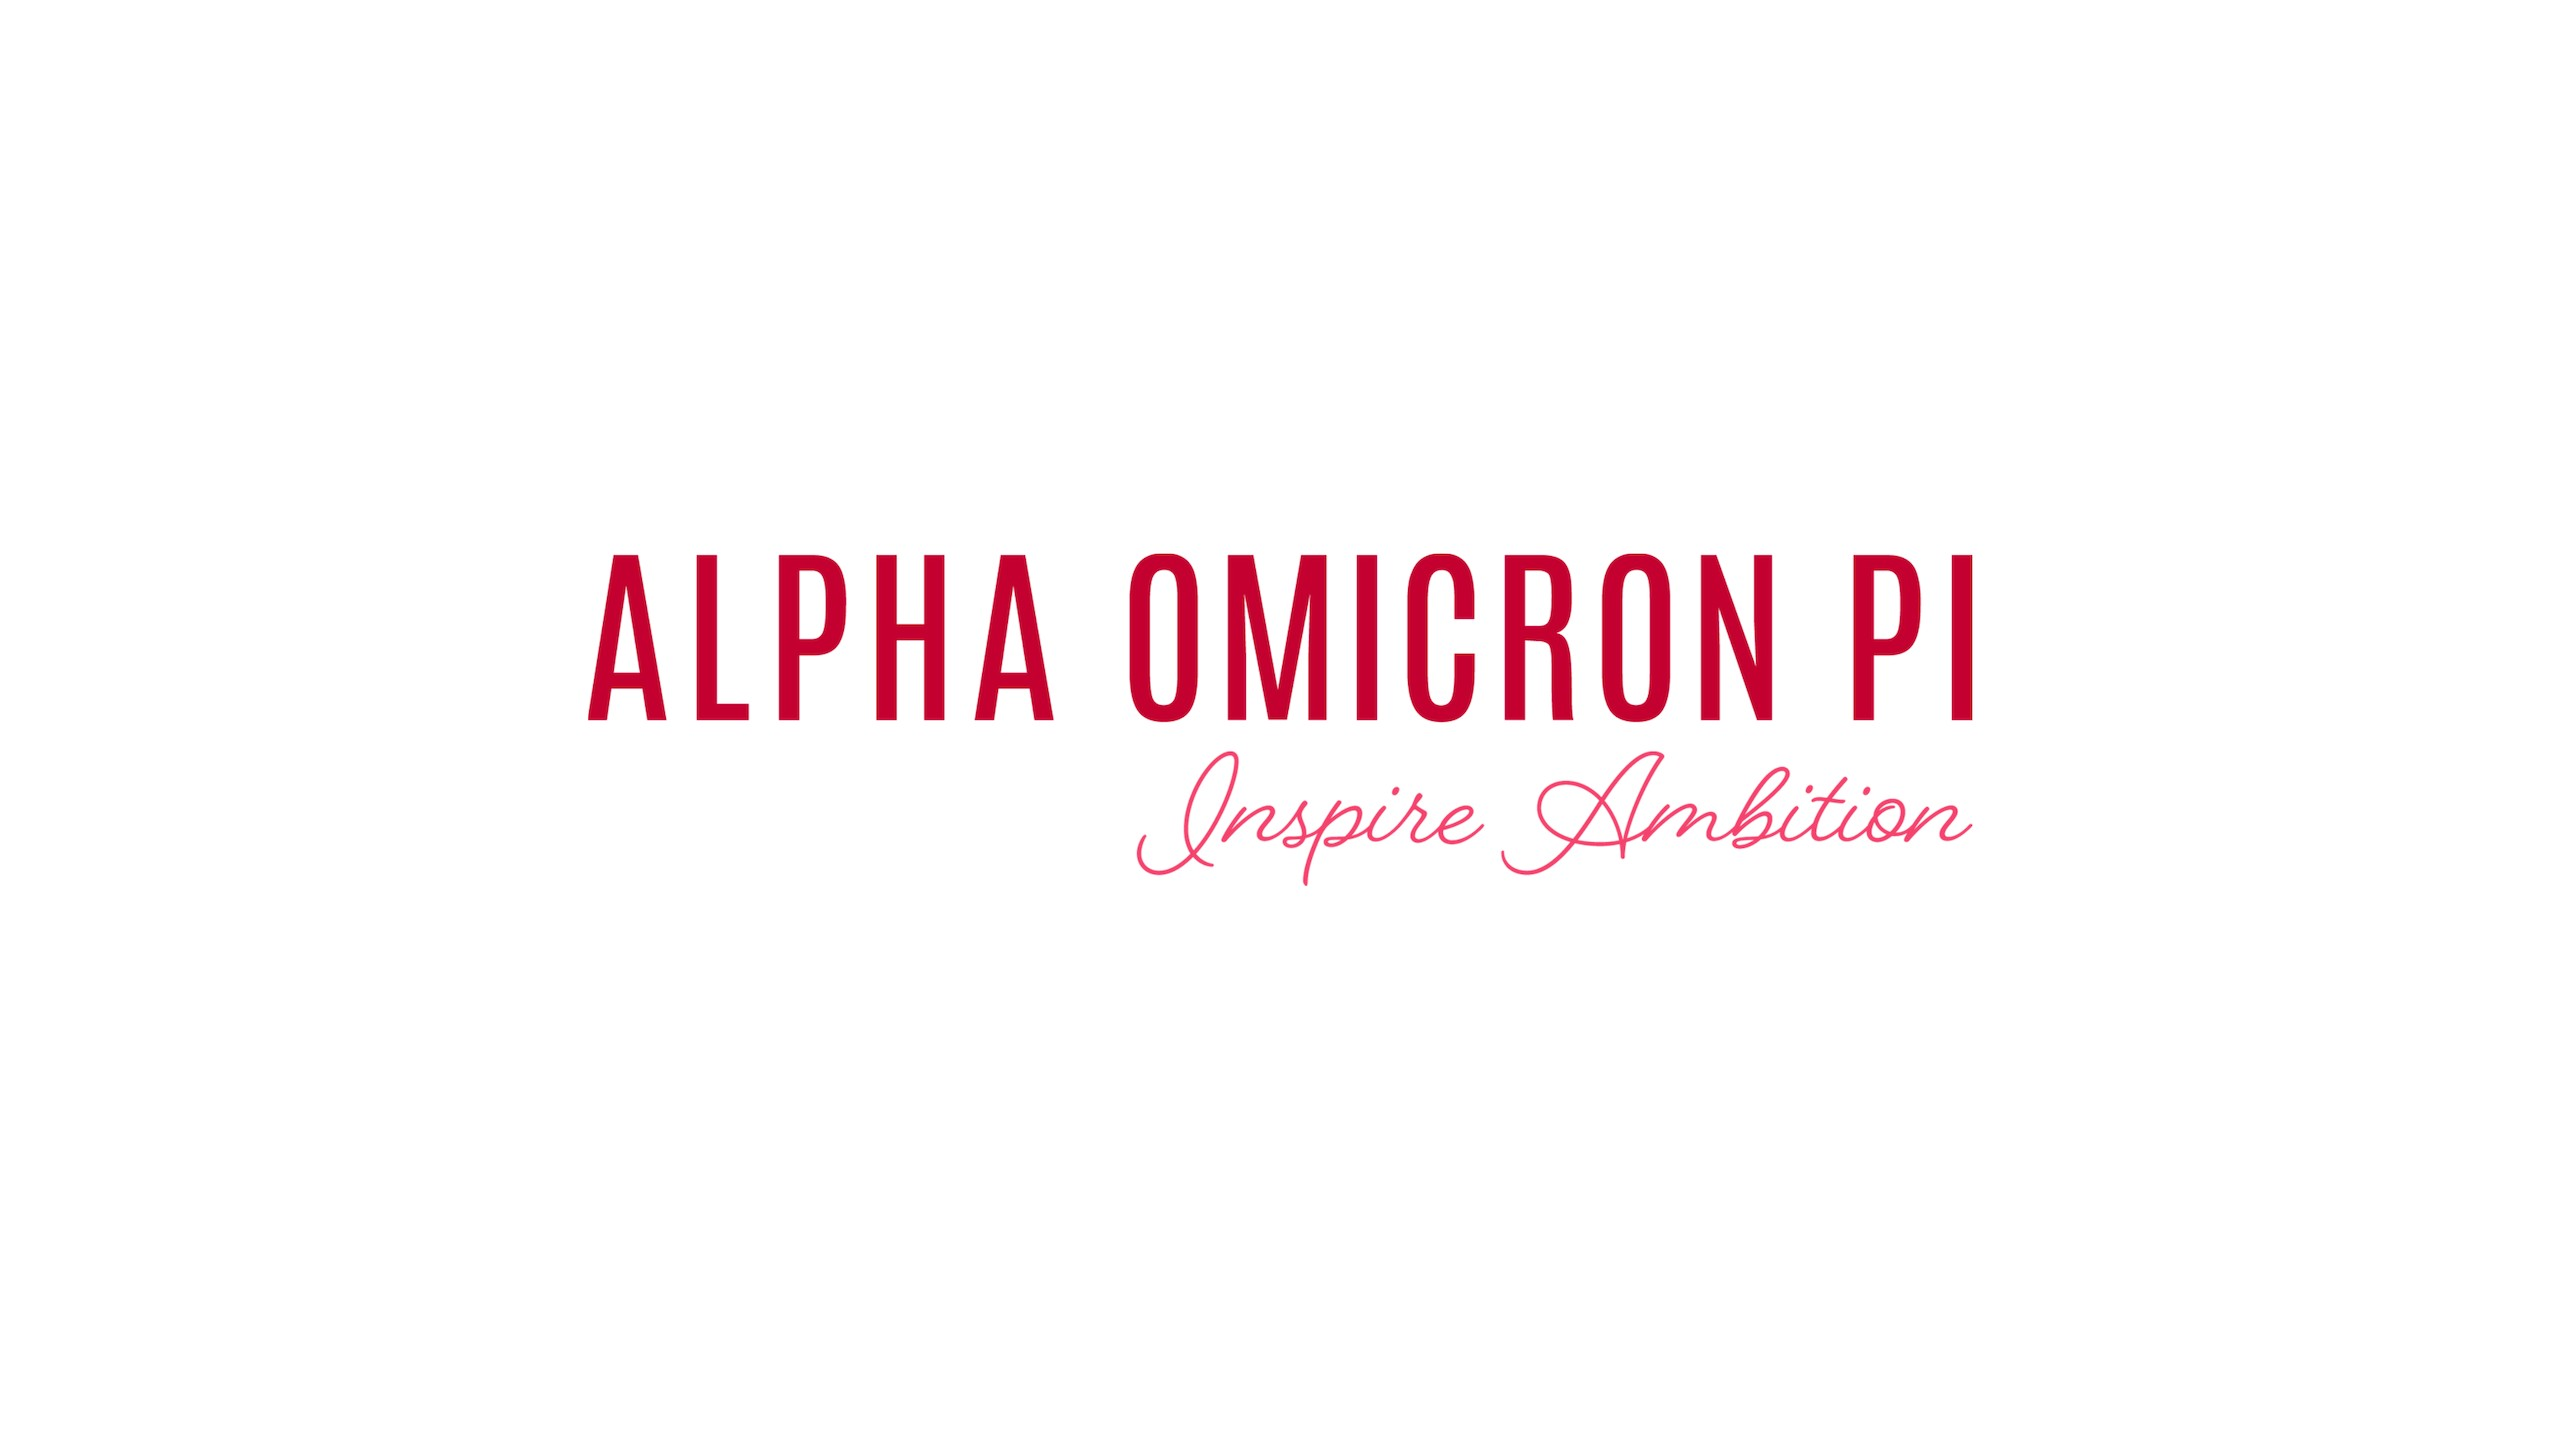 Alpha Omicron Pi Fraternity | LinkedIn